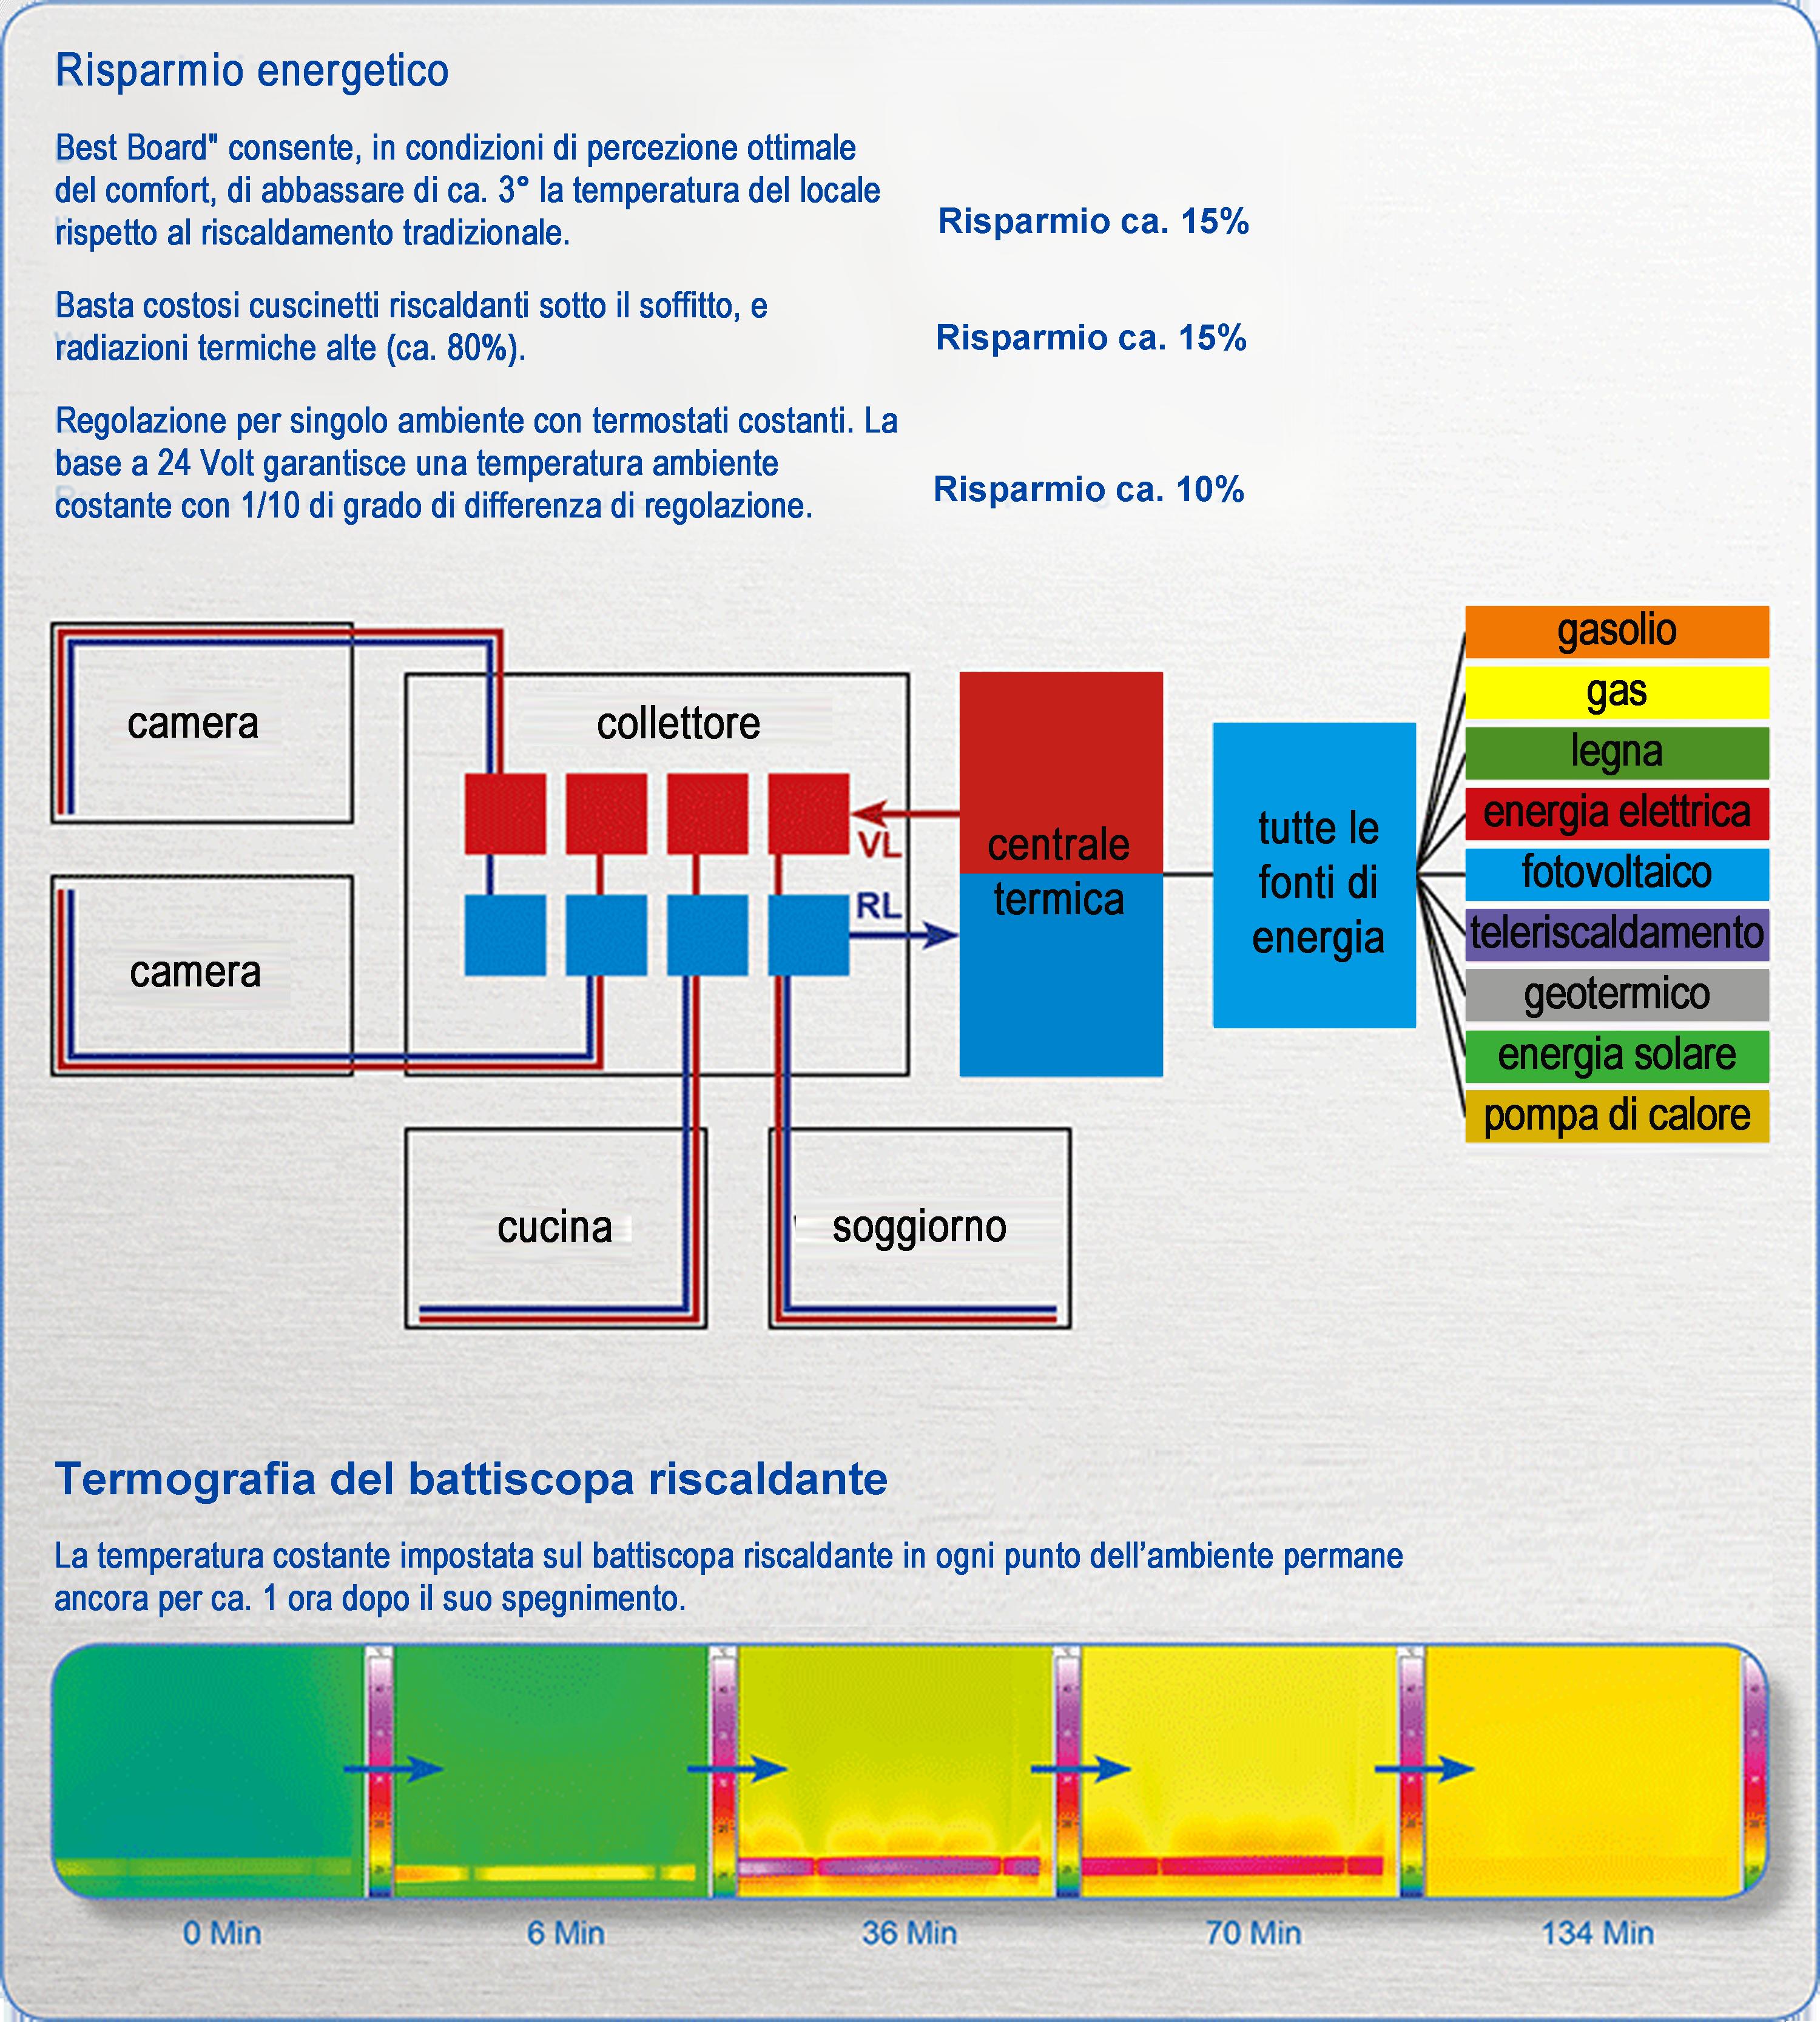 Geg srl best board riscaldamento radiante molecolare a for Stufa radiante a risparmio energetico